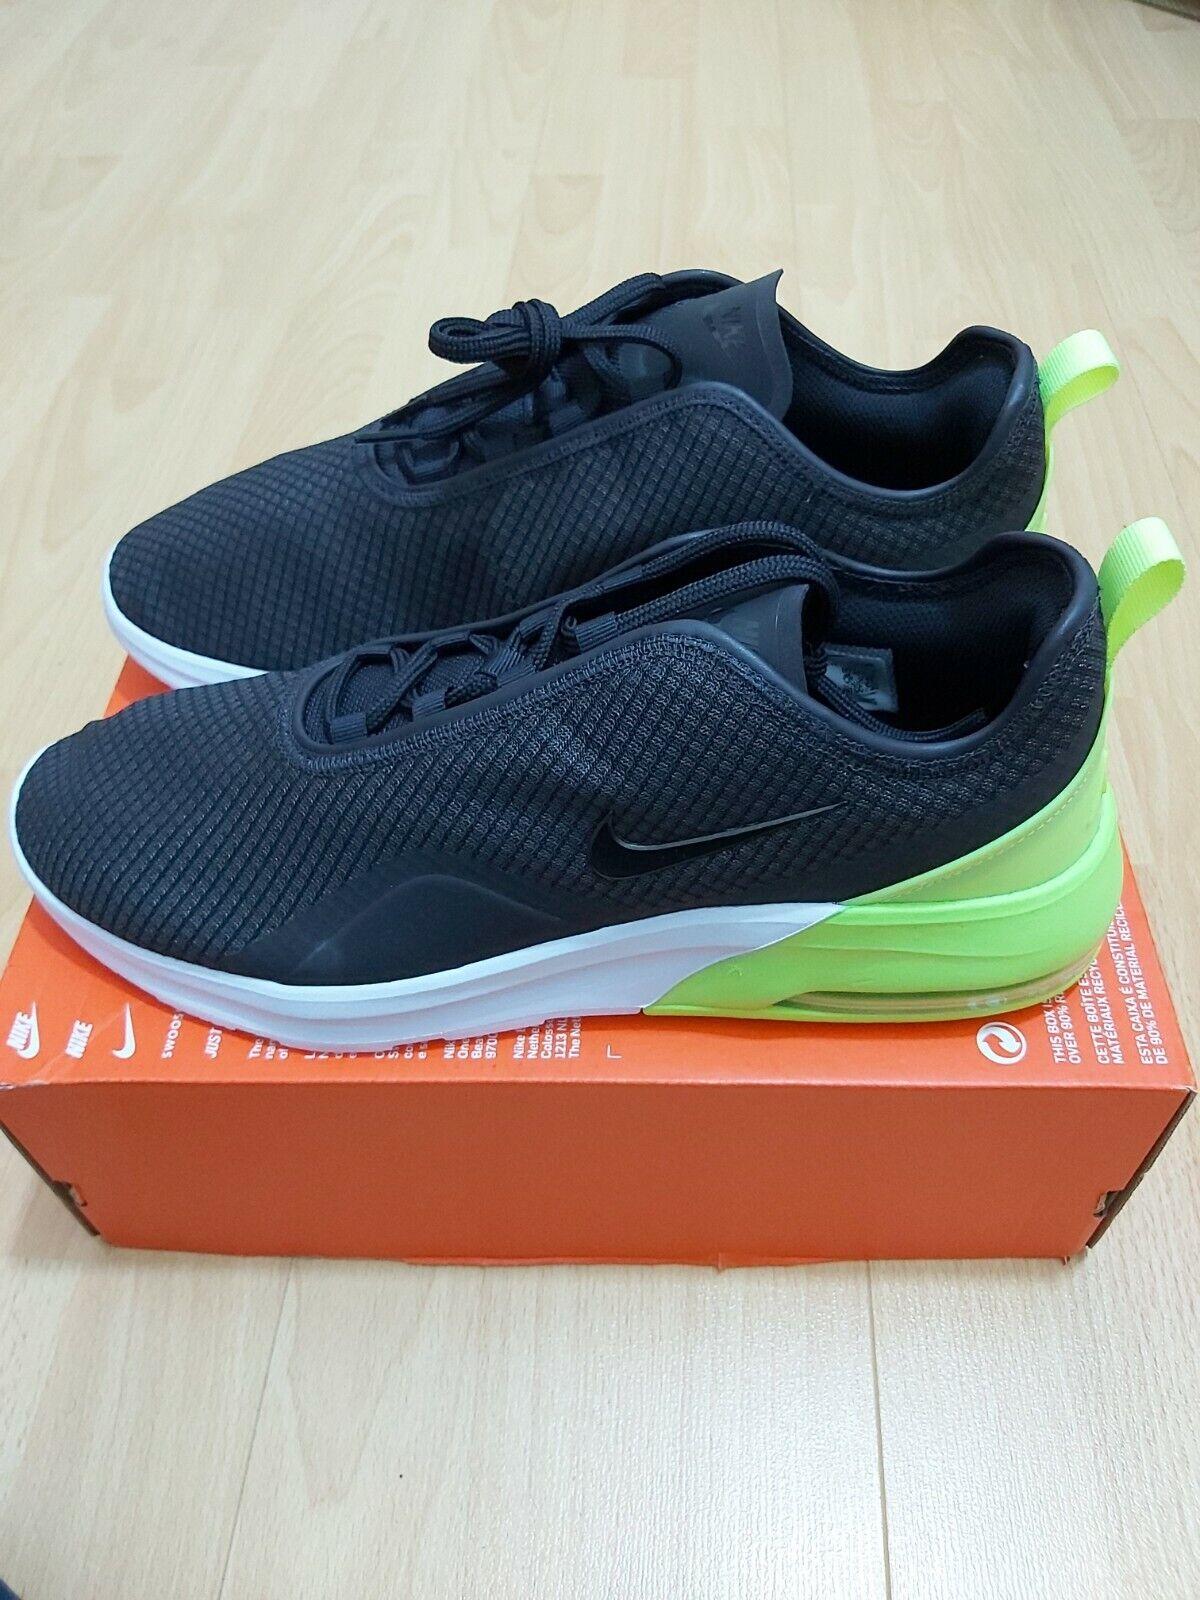 New Nike React LEGEND 8 PRO IC MEN'S UK SIZE 10 EU 45